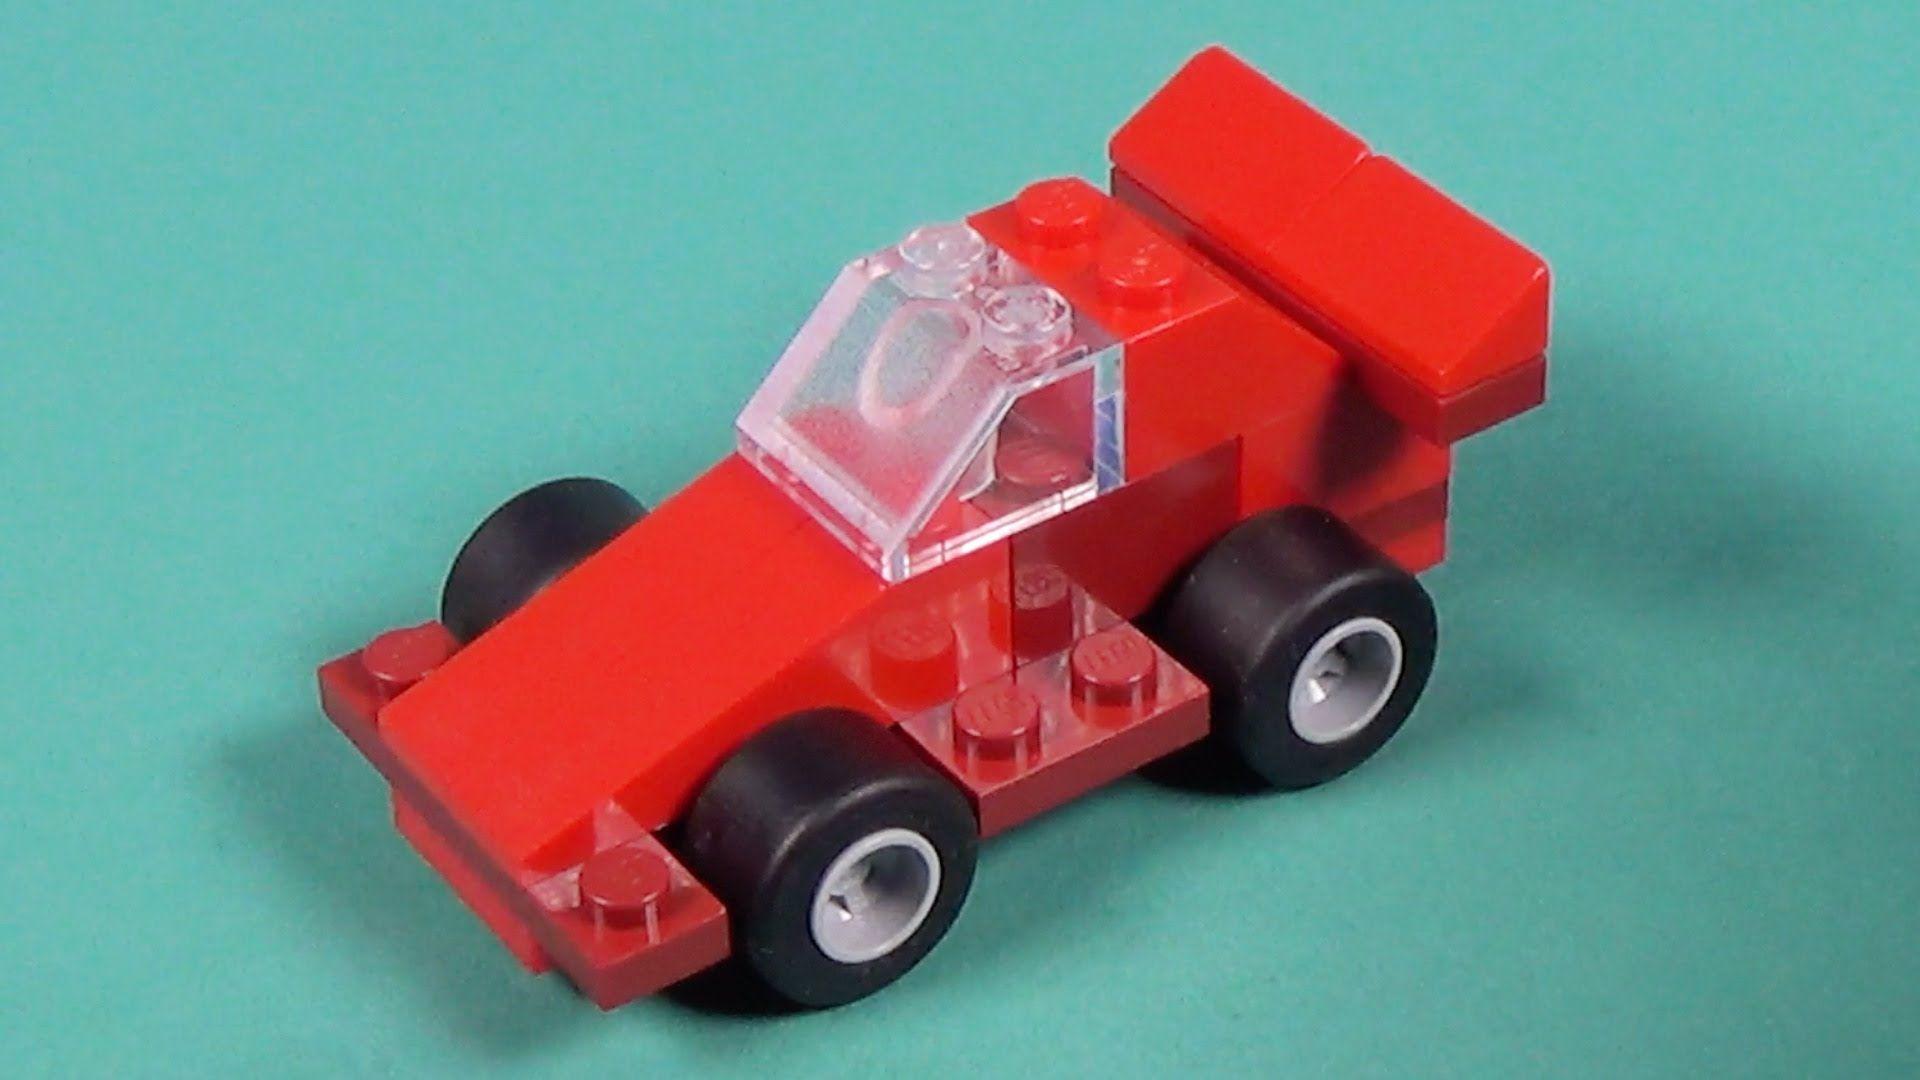 Lego Mini Race Car Building Instructions Lego Classic 10692 How